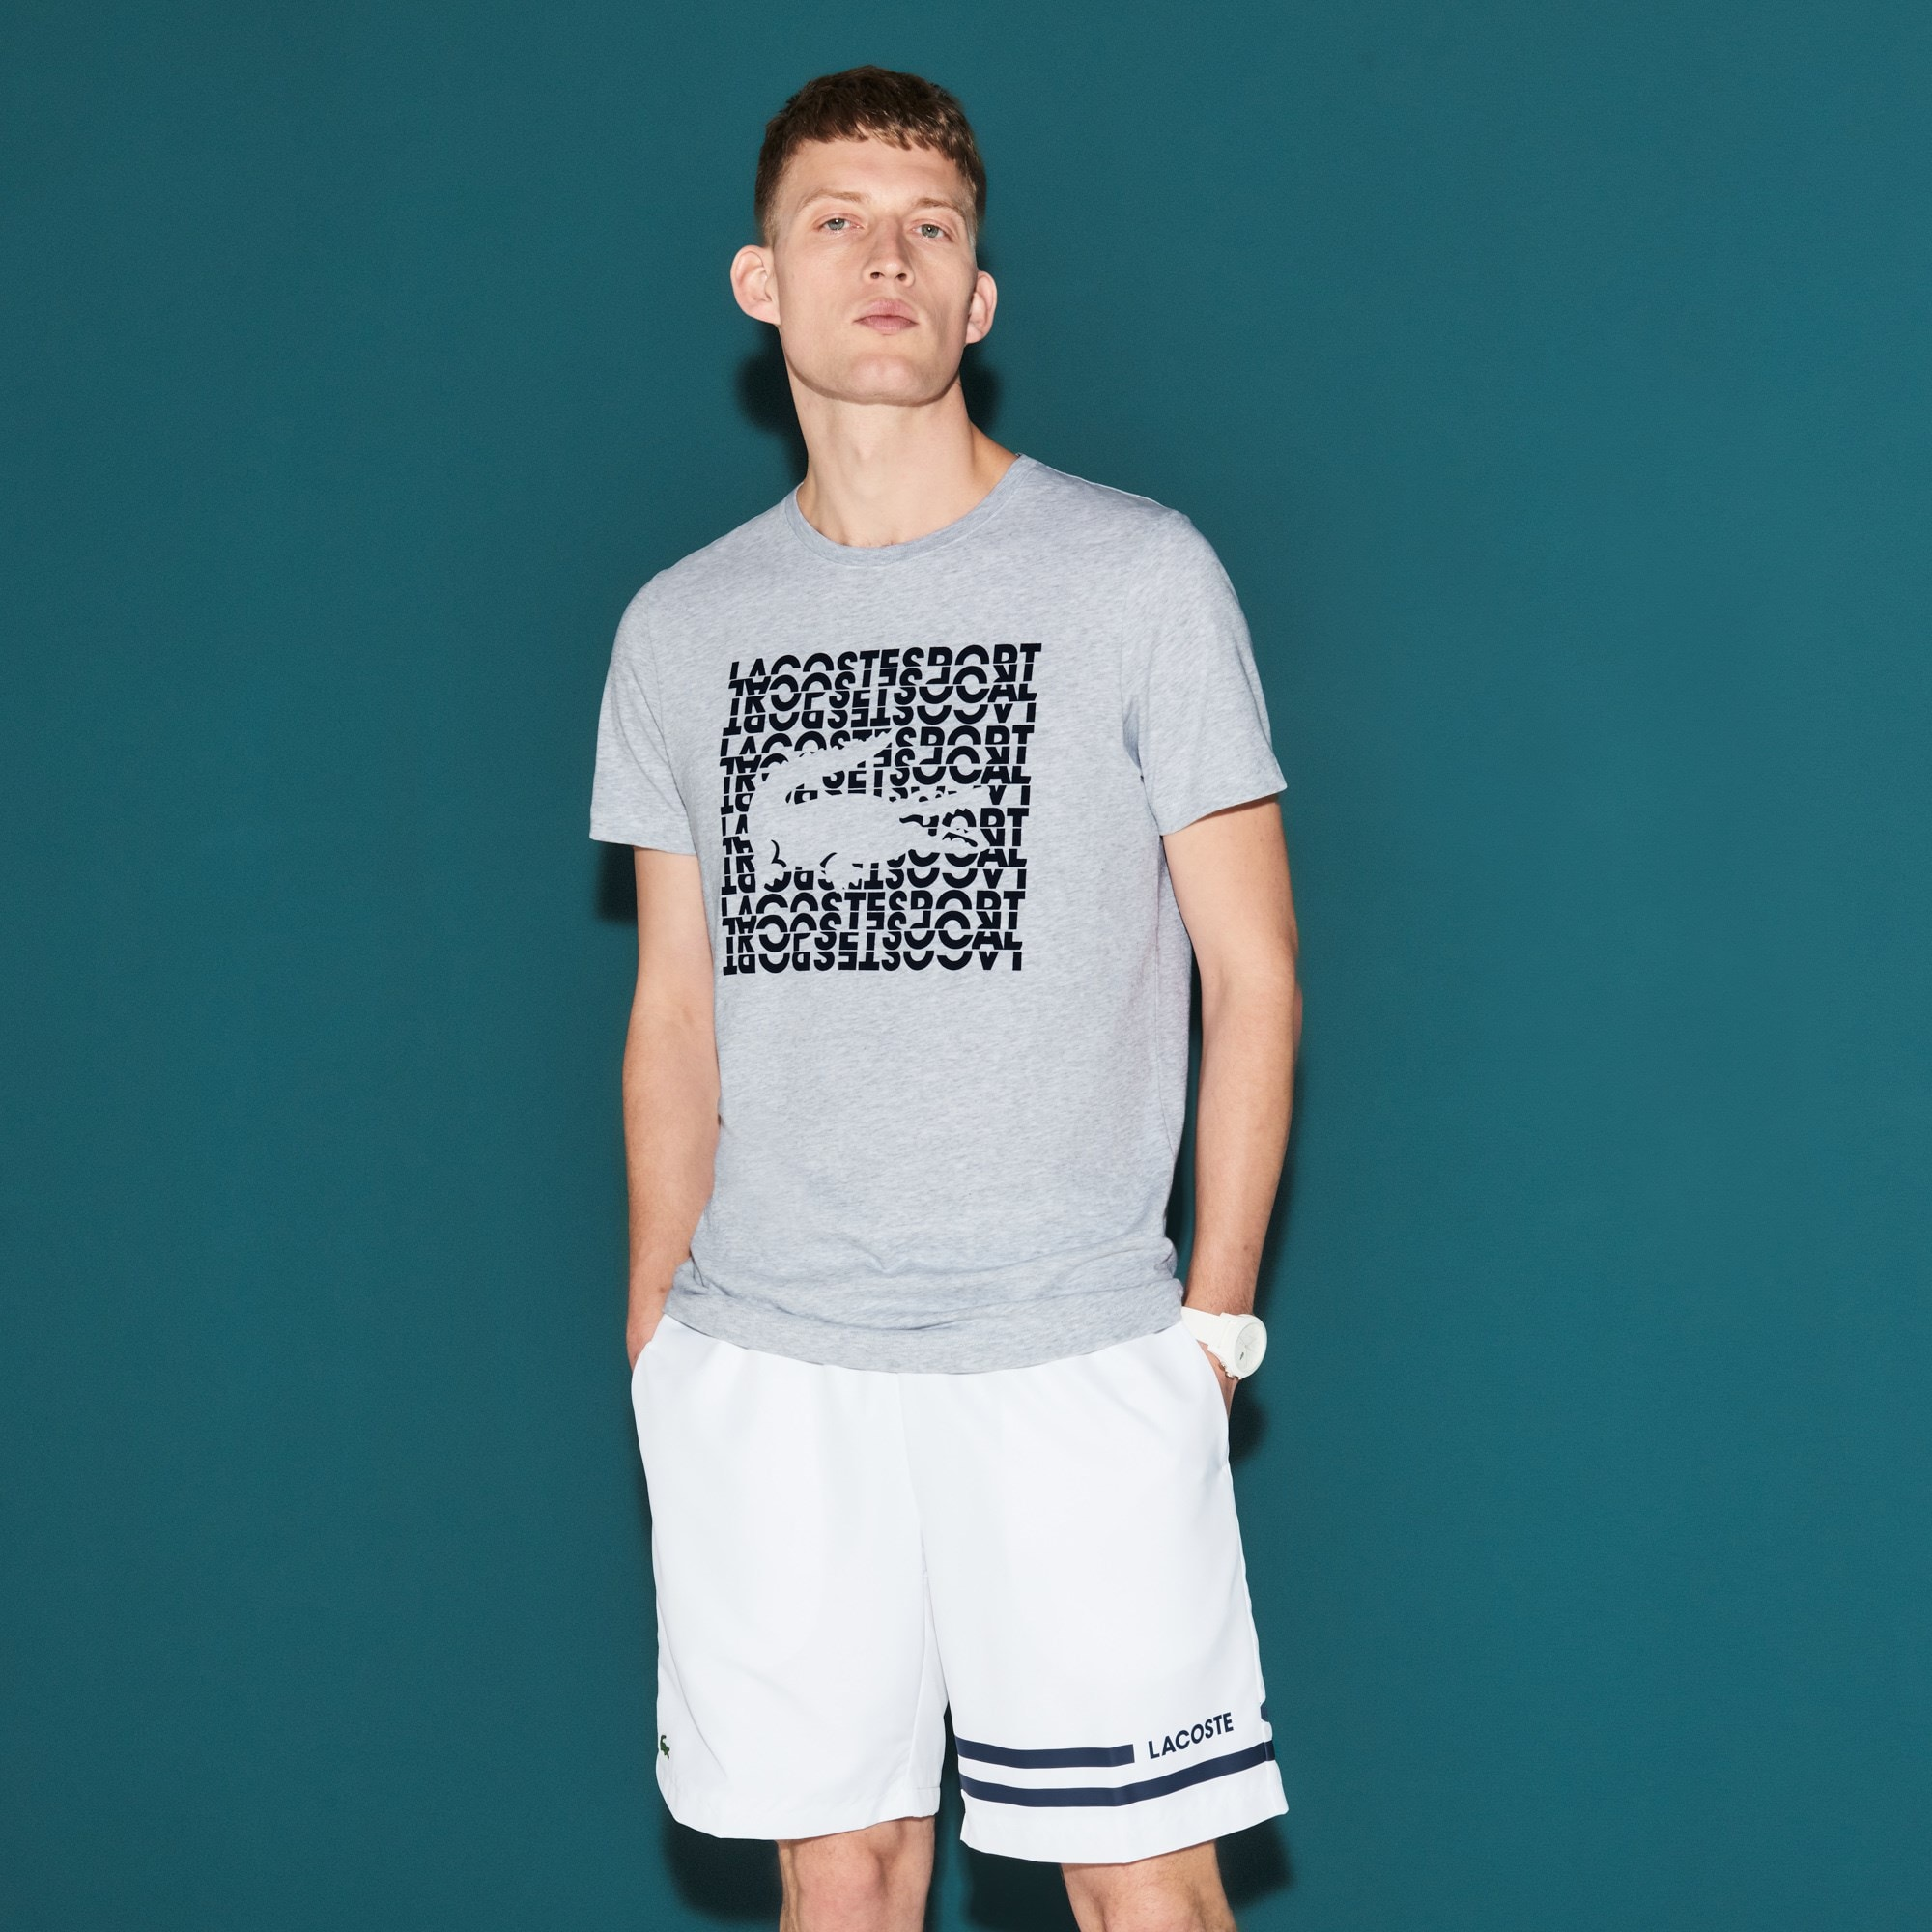 Camiseta Con Logo Tenis Lacoste Sport